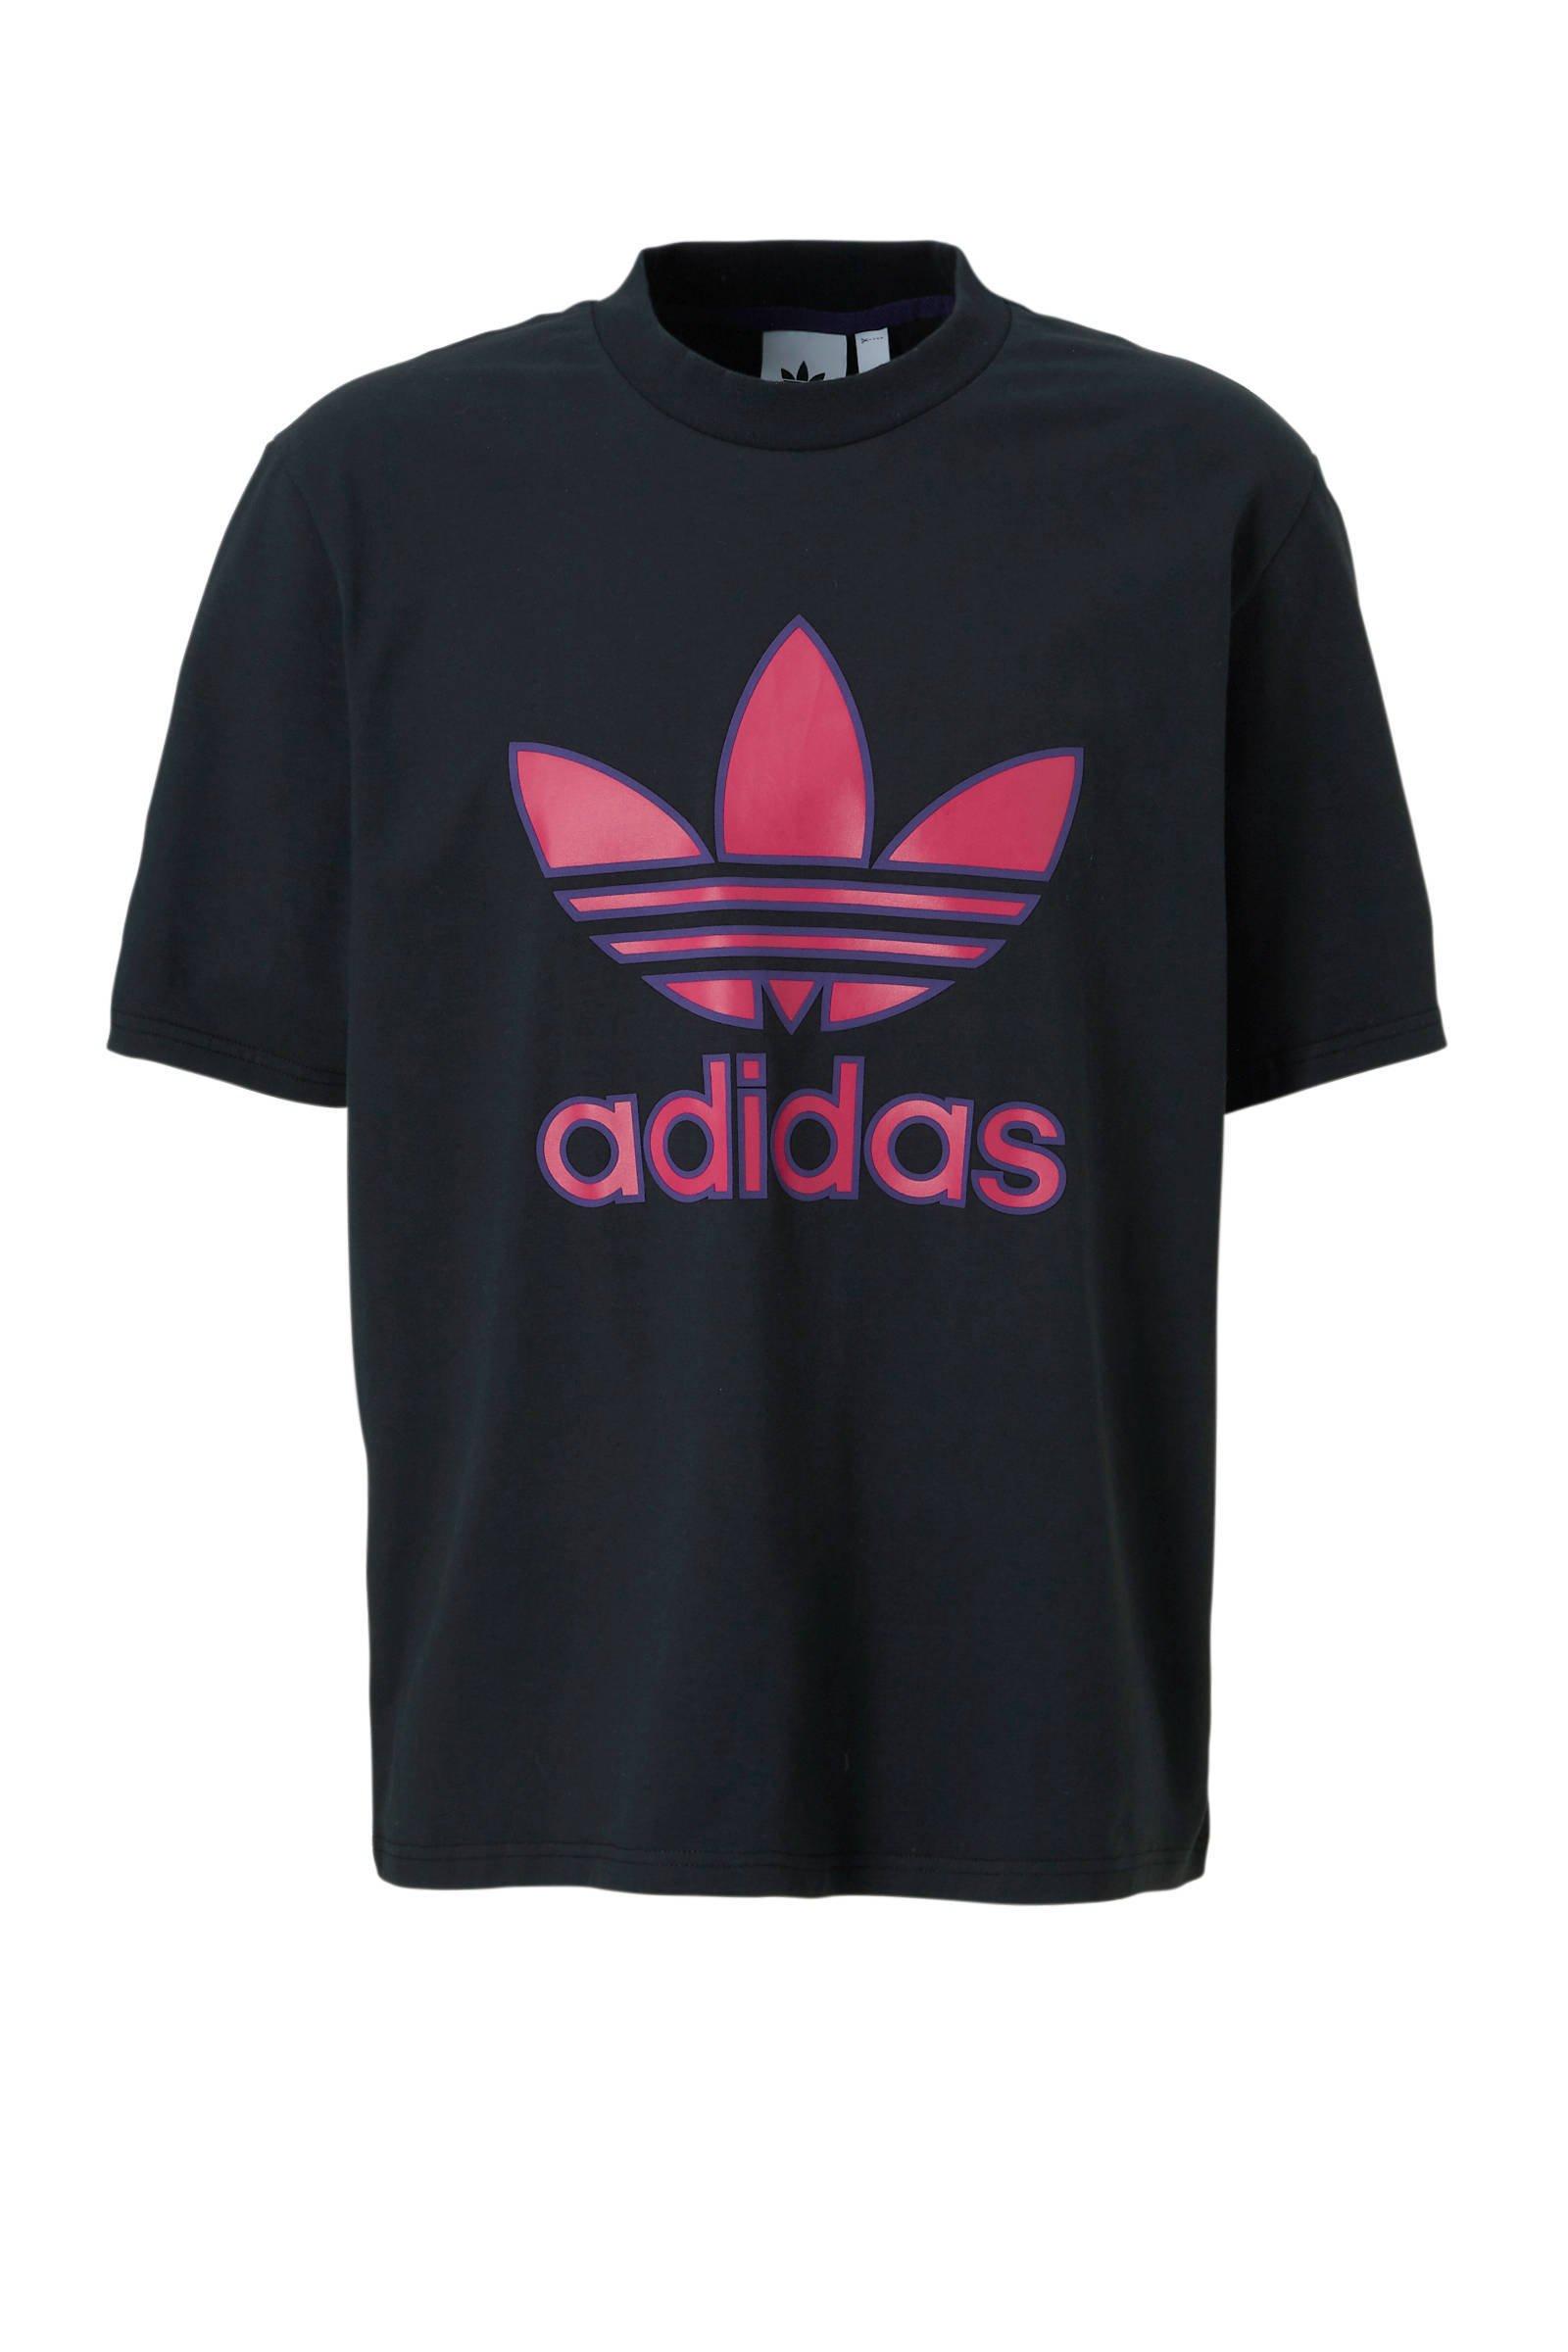 adidas originals T shirt zwart | wehkamp